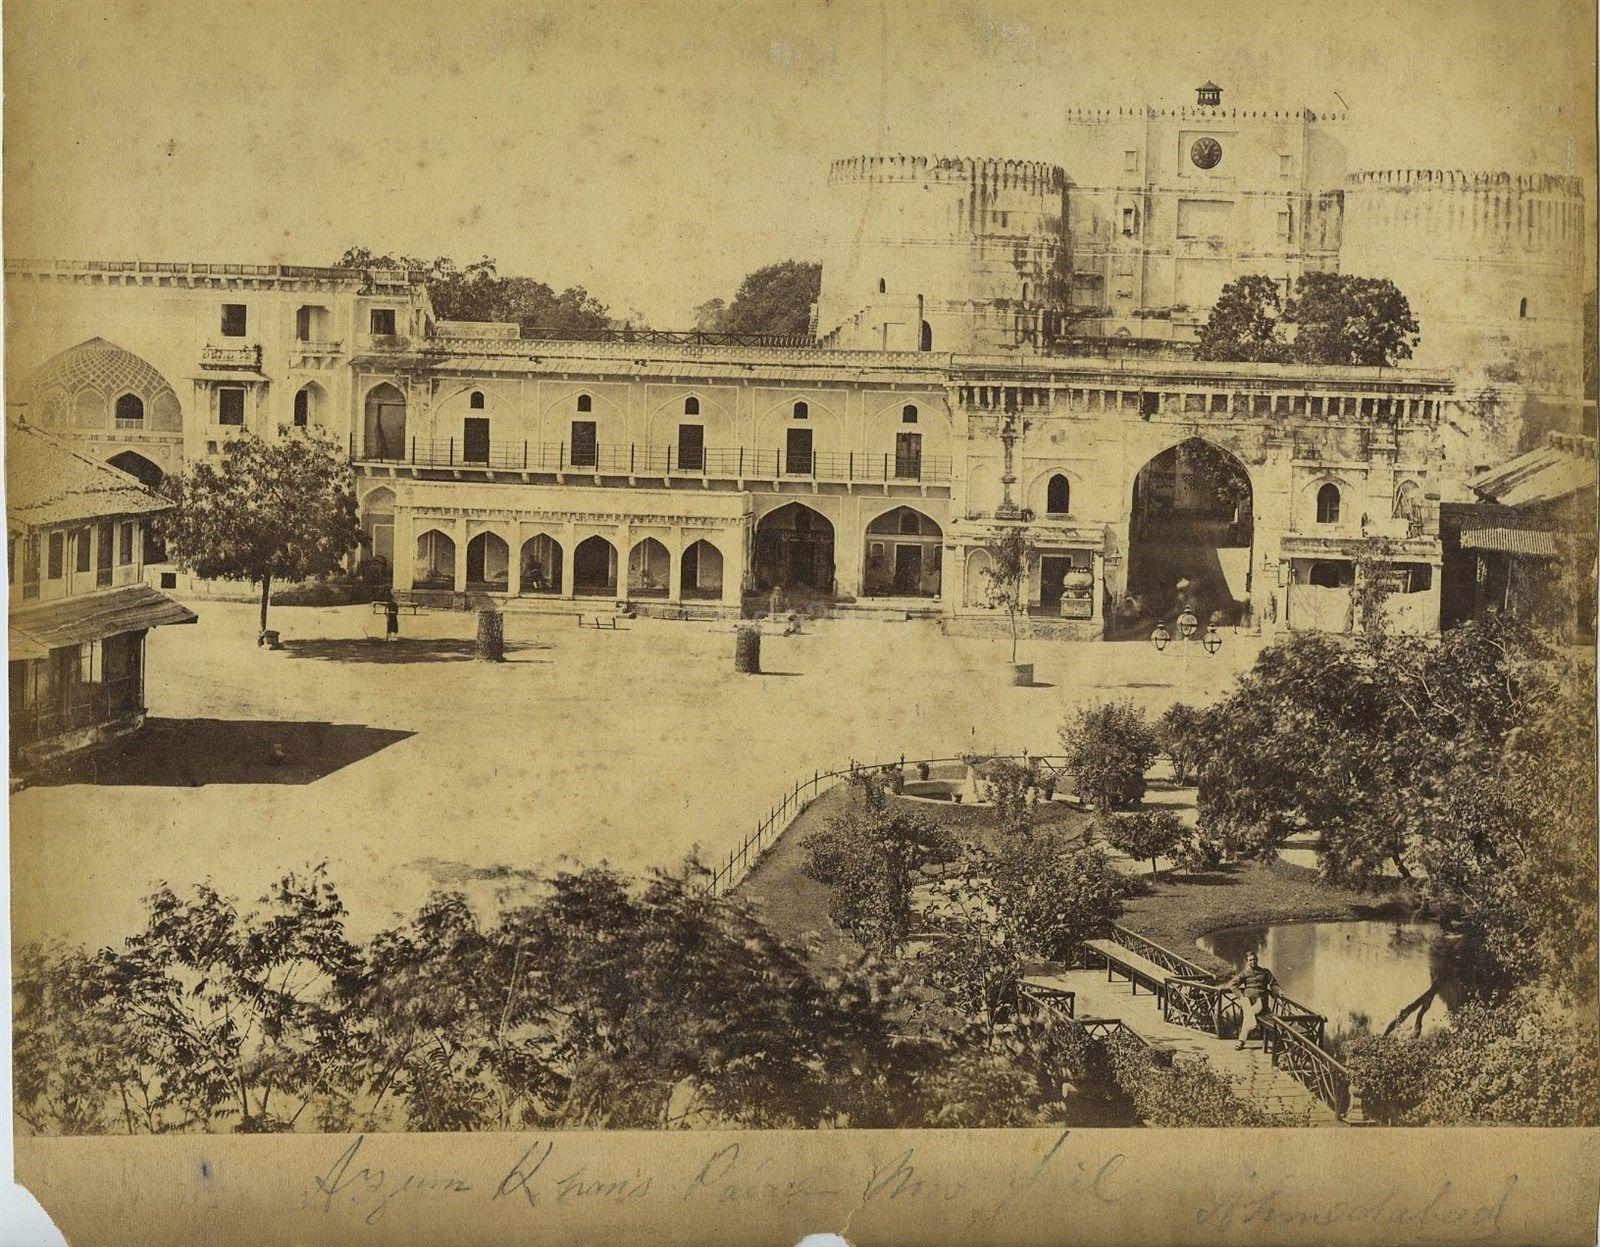 Azum Khan's Palace in Ahmedabad, Gujarat - c1870's